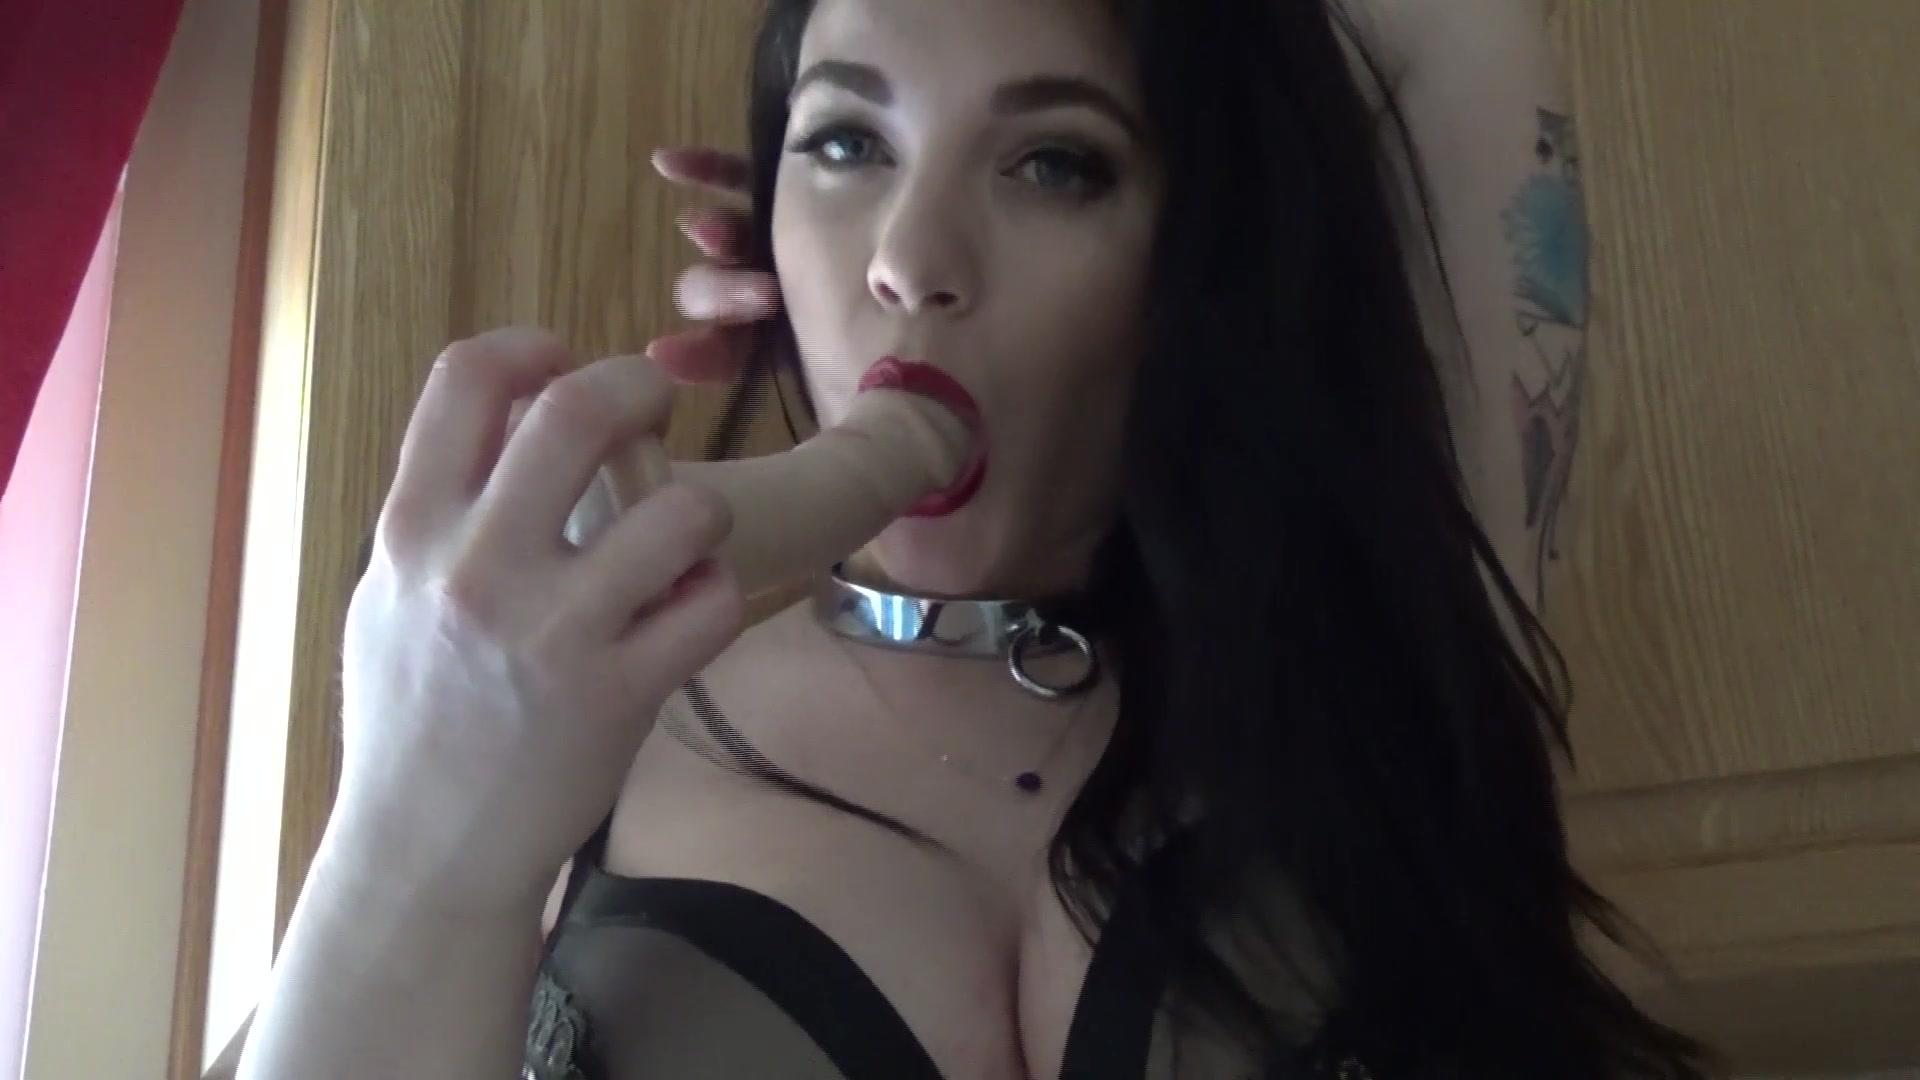 emilylynne countertop premium video - camvideos.tv